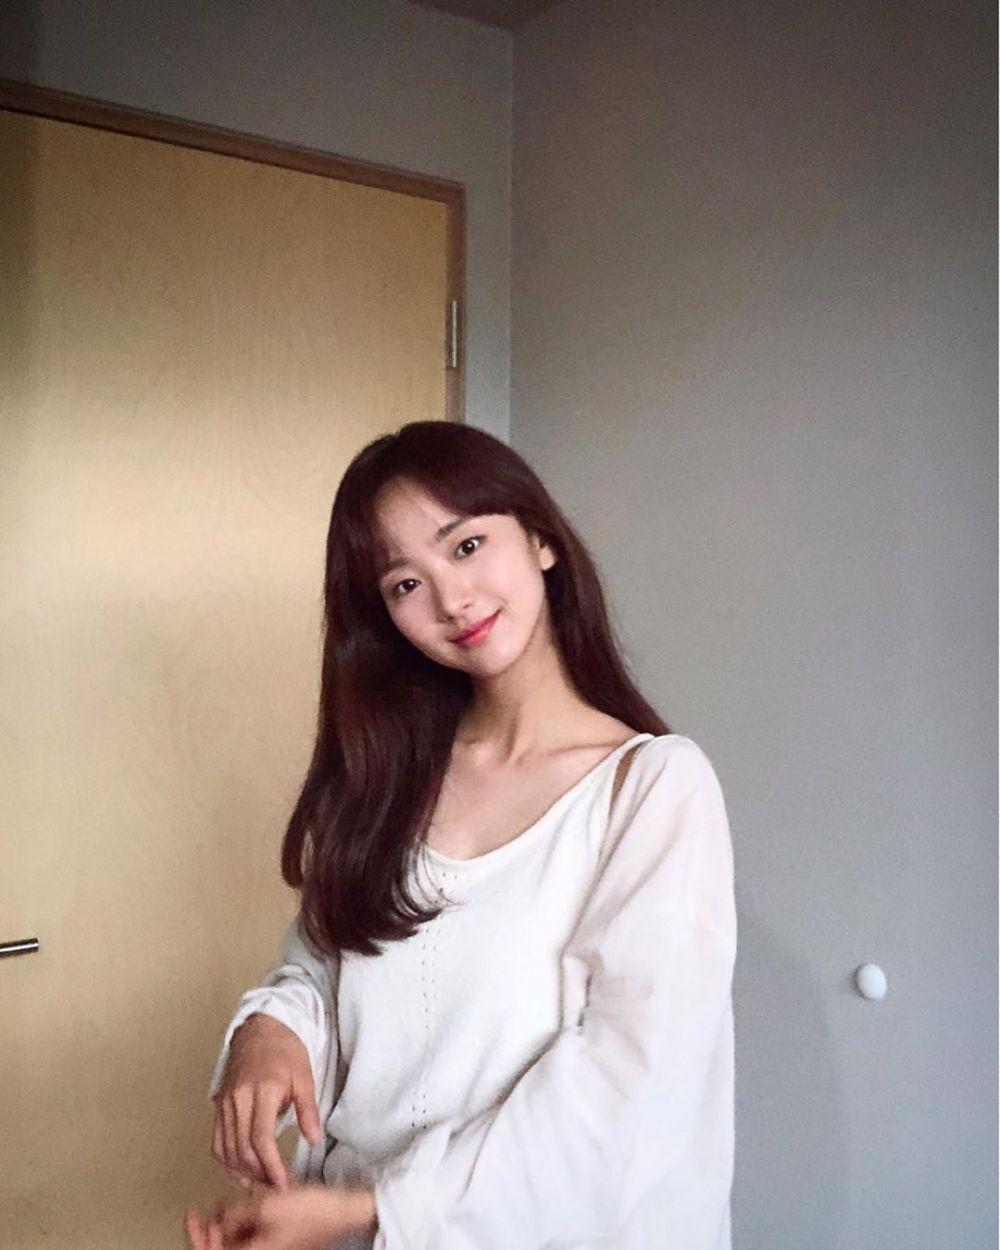 10 Pesona Paripurna Won Jin Ah yang Jadi 'Kekasih' Ji Chang Wook